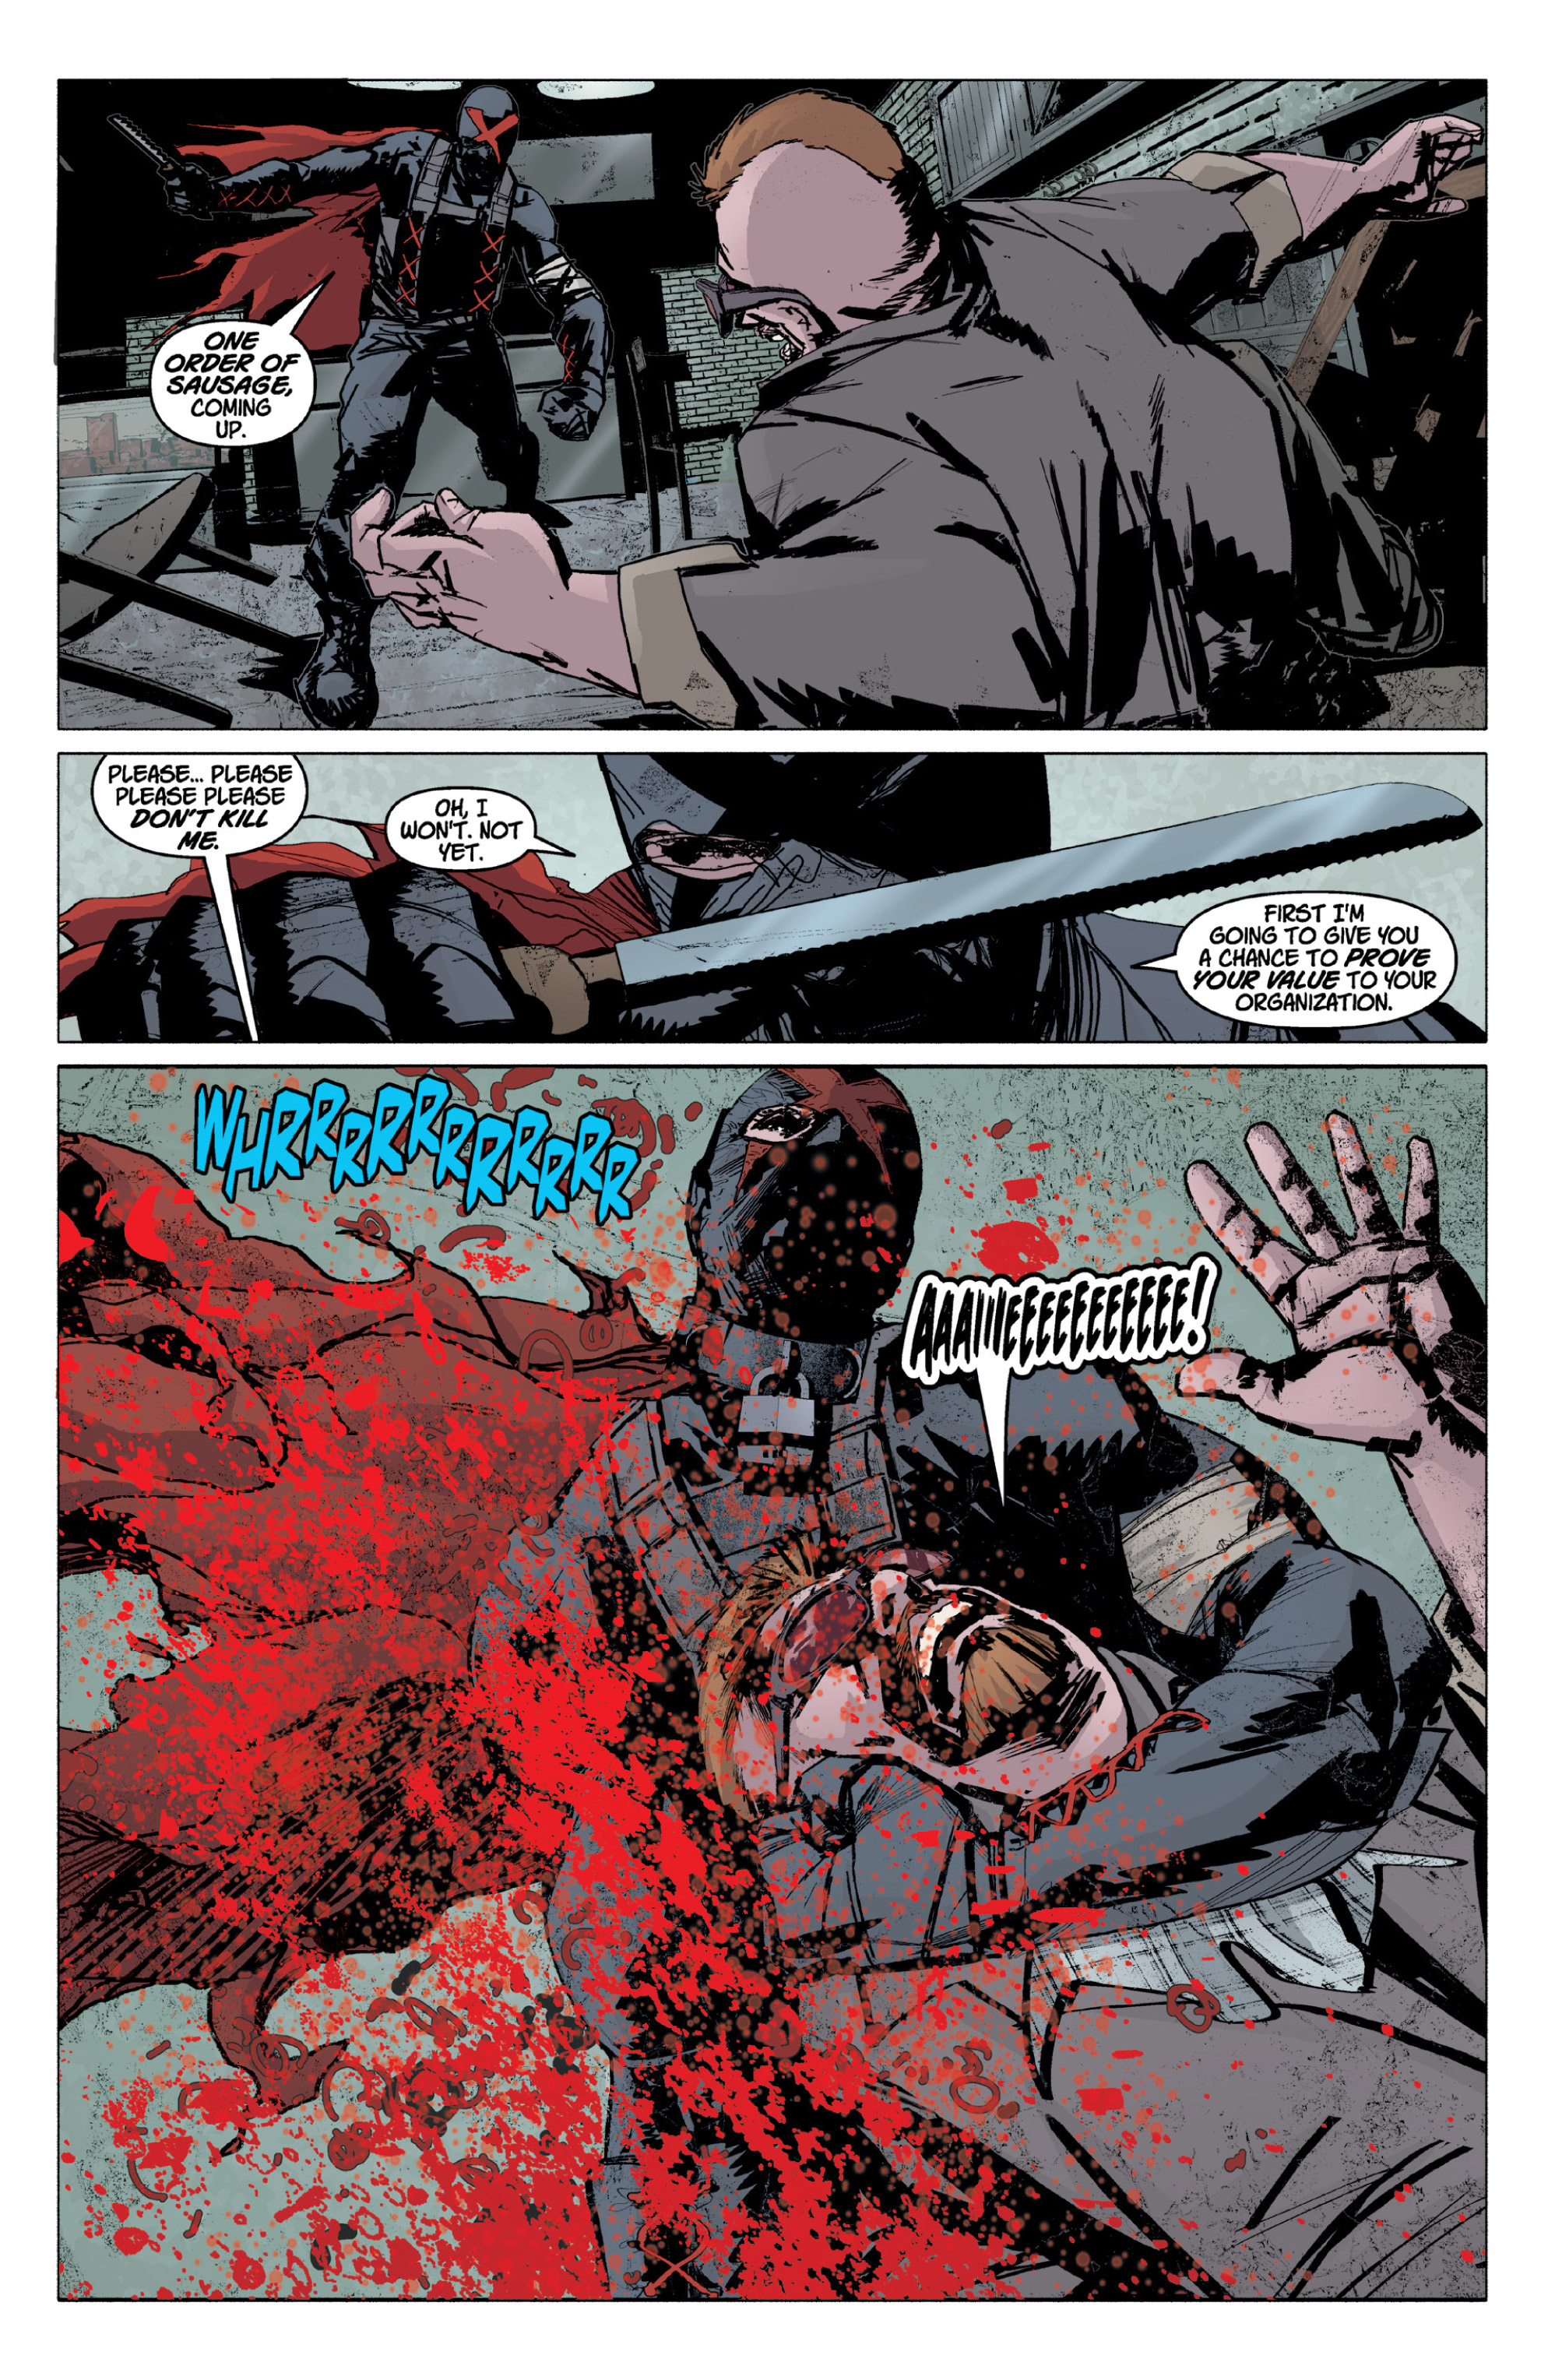 Read online X: Big Bad comic -  Issue # Full - 15